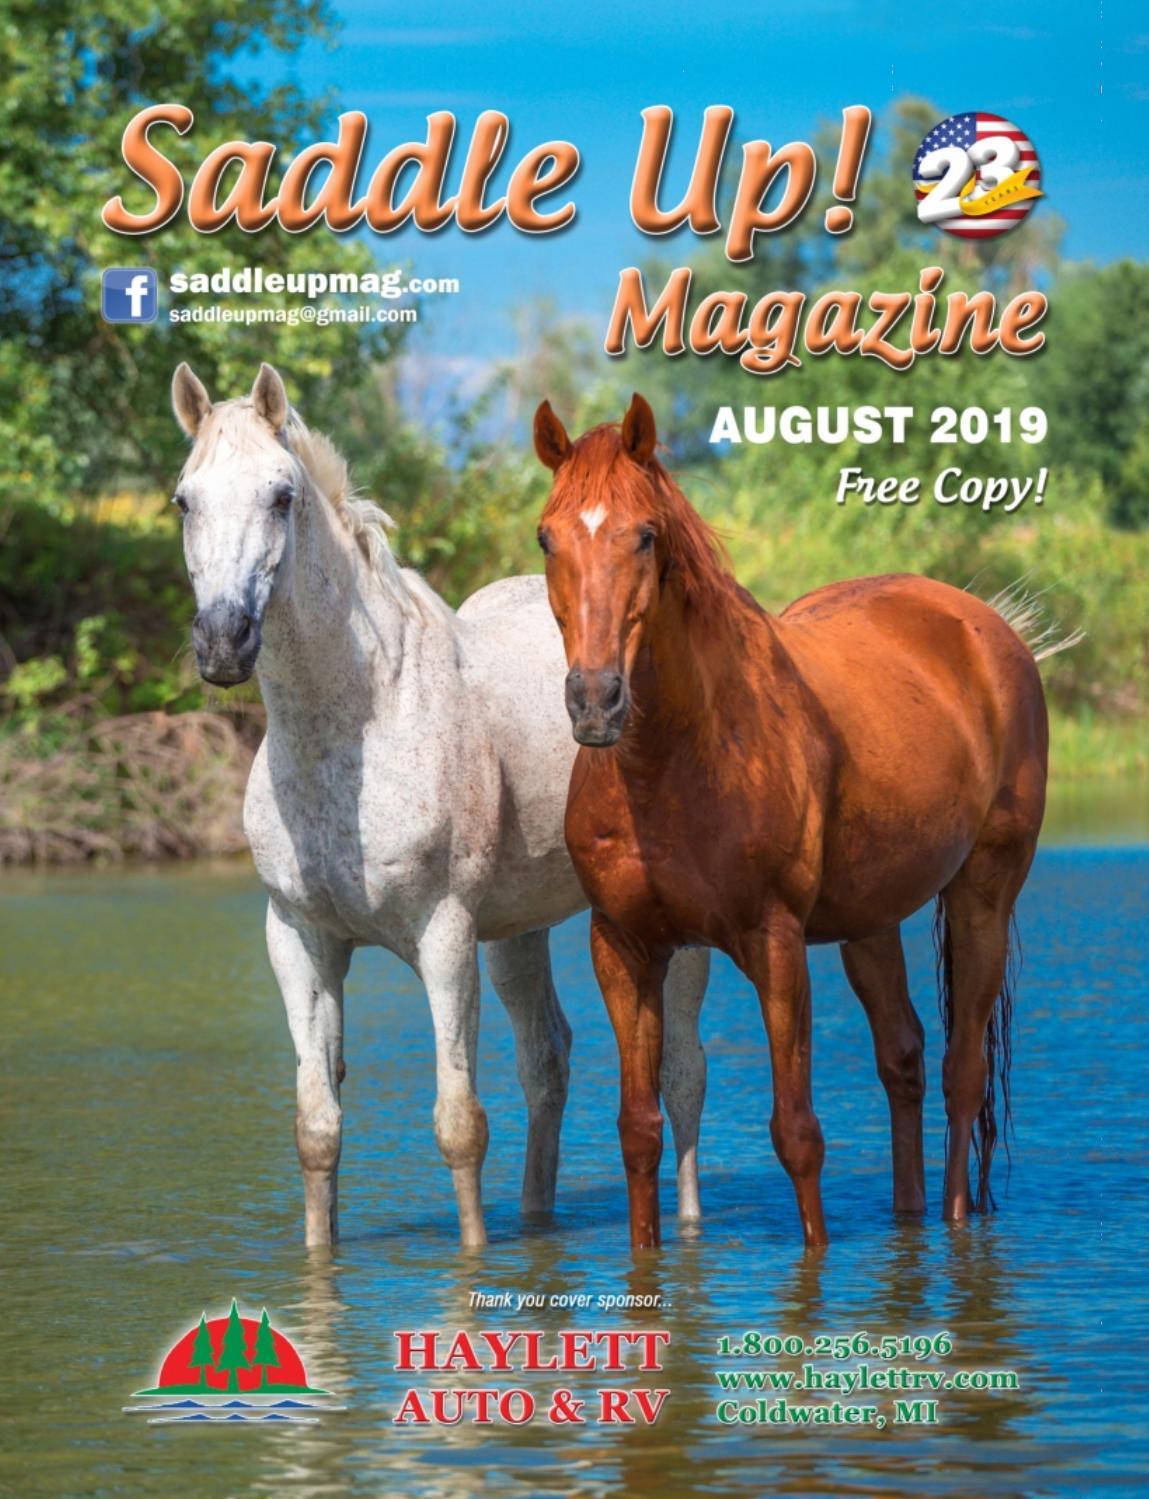 EX LARGE HORSE HAY NETS 4FT DIA 3//4  HAY BALE SIZE LARGE FEED BAG 5